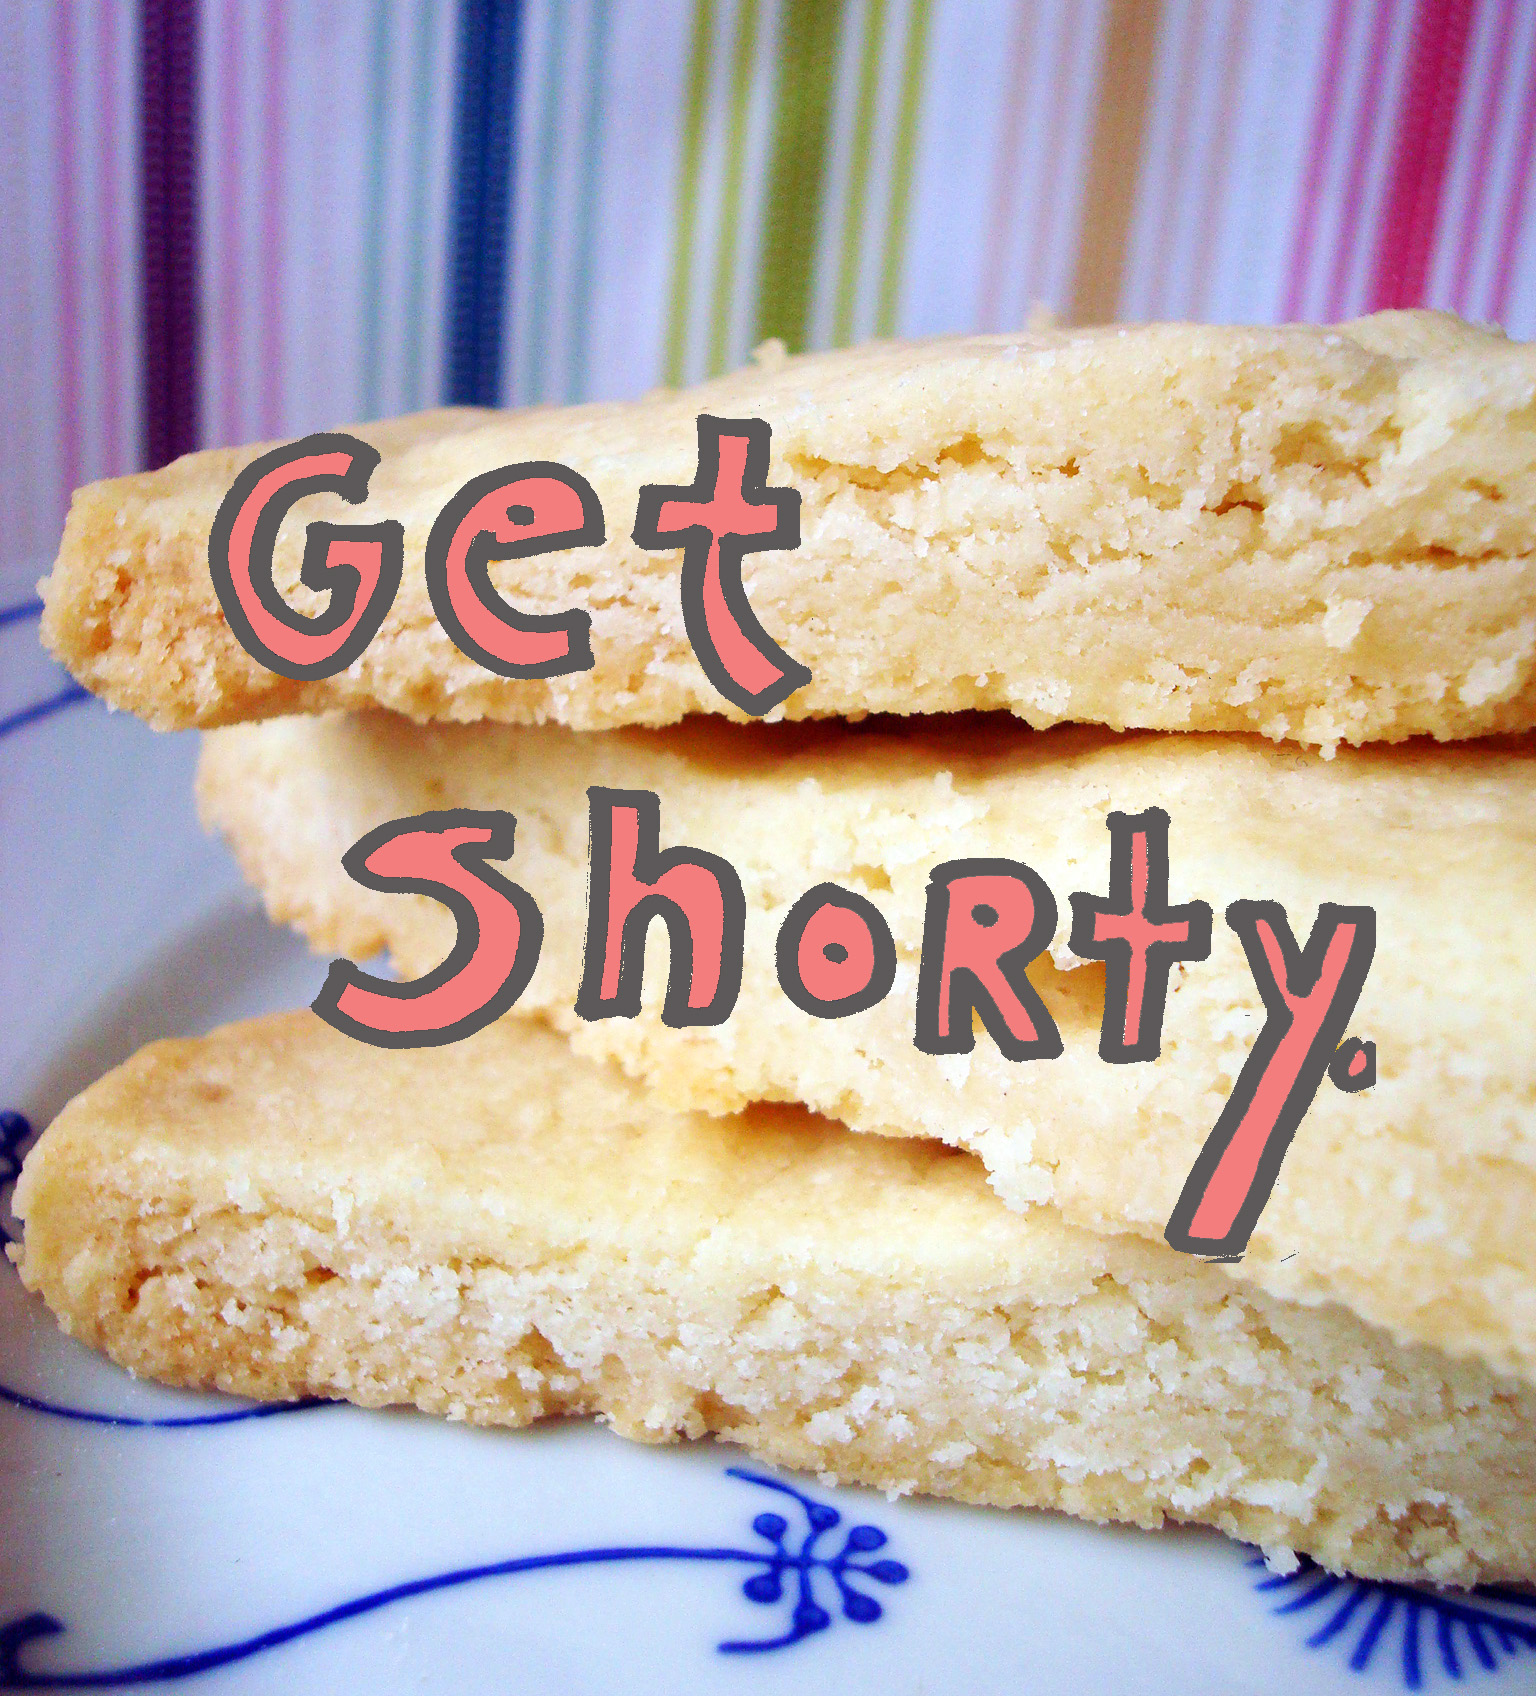 Get Shorty - Shortbread Tutorial on Bluprint